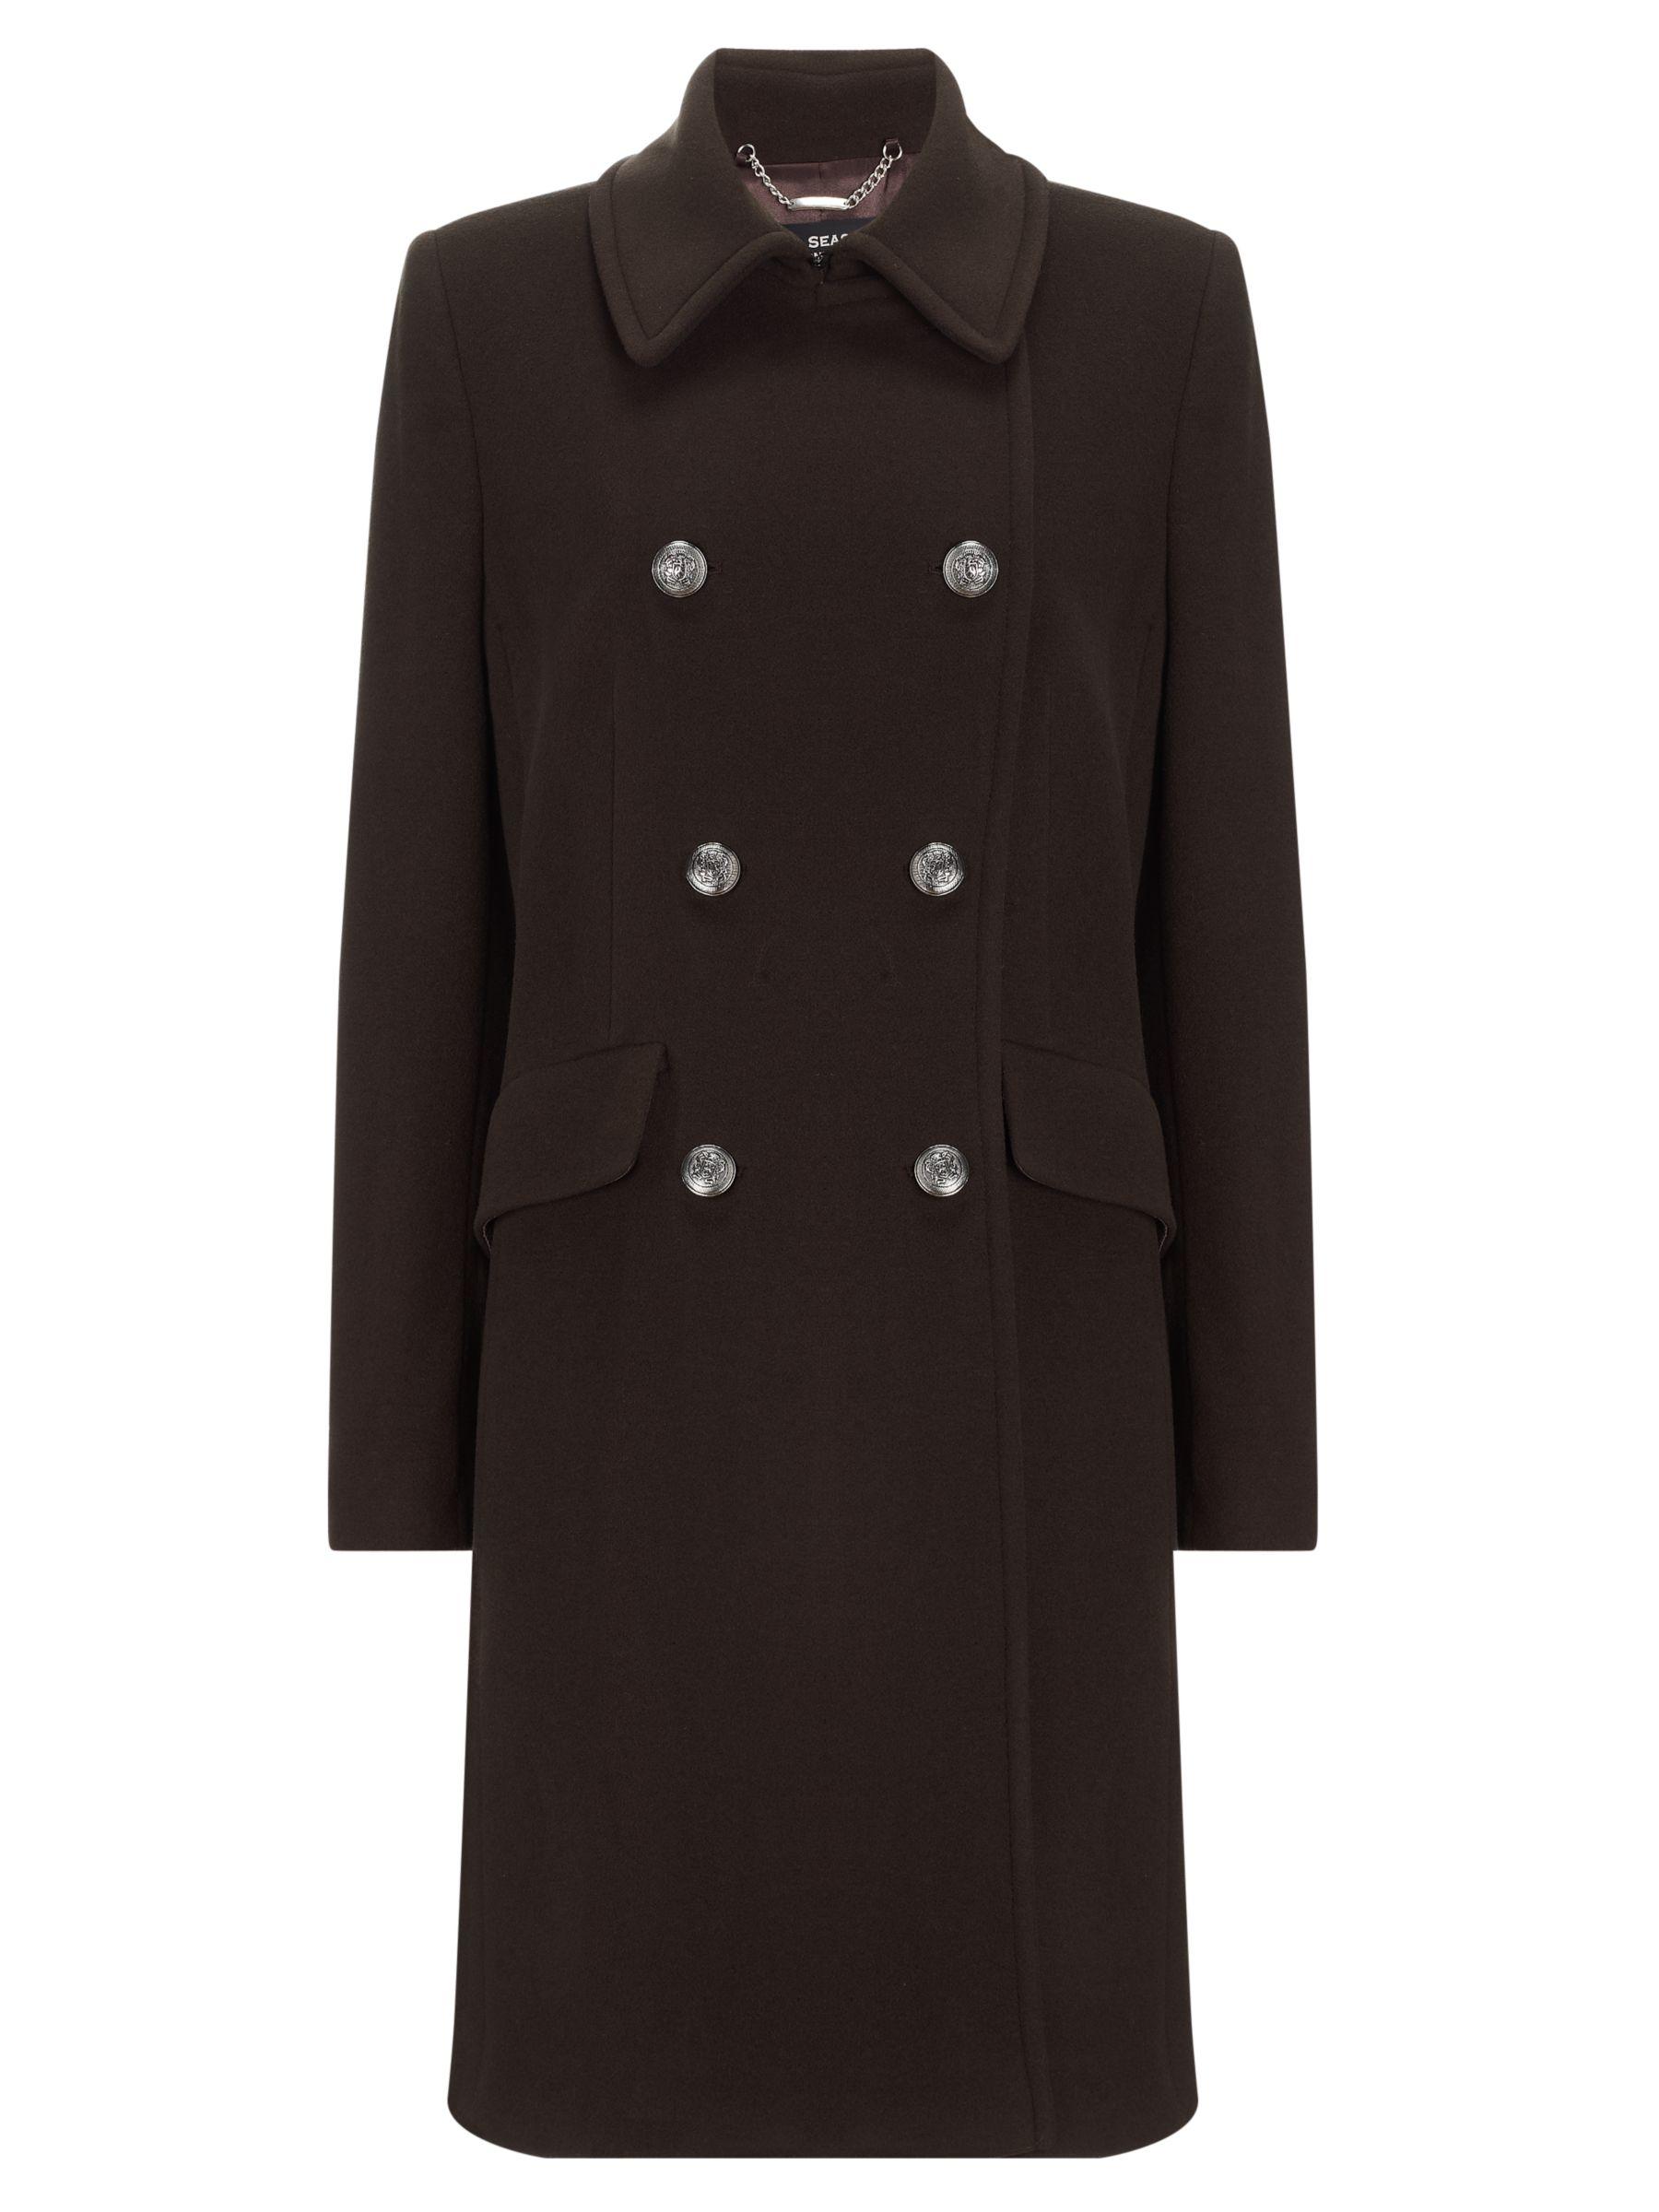 Four Seasons Military Coat Loden